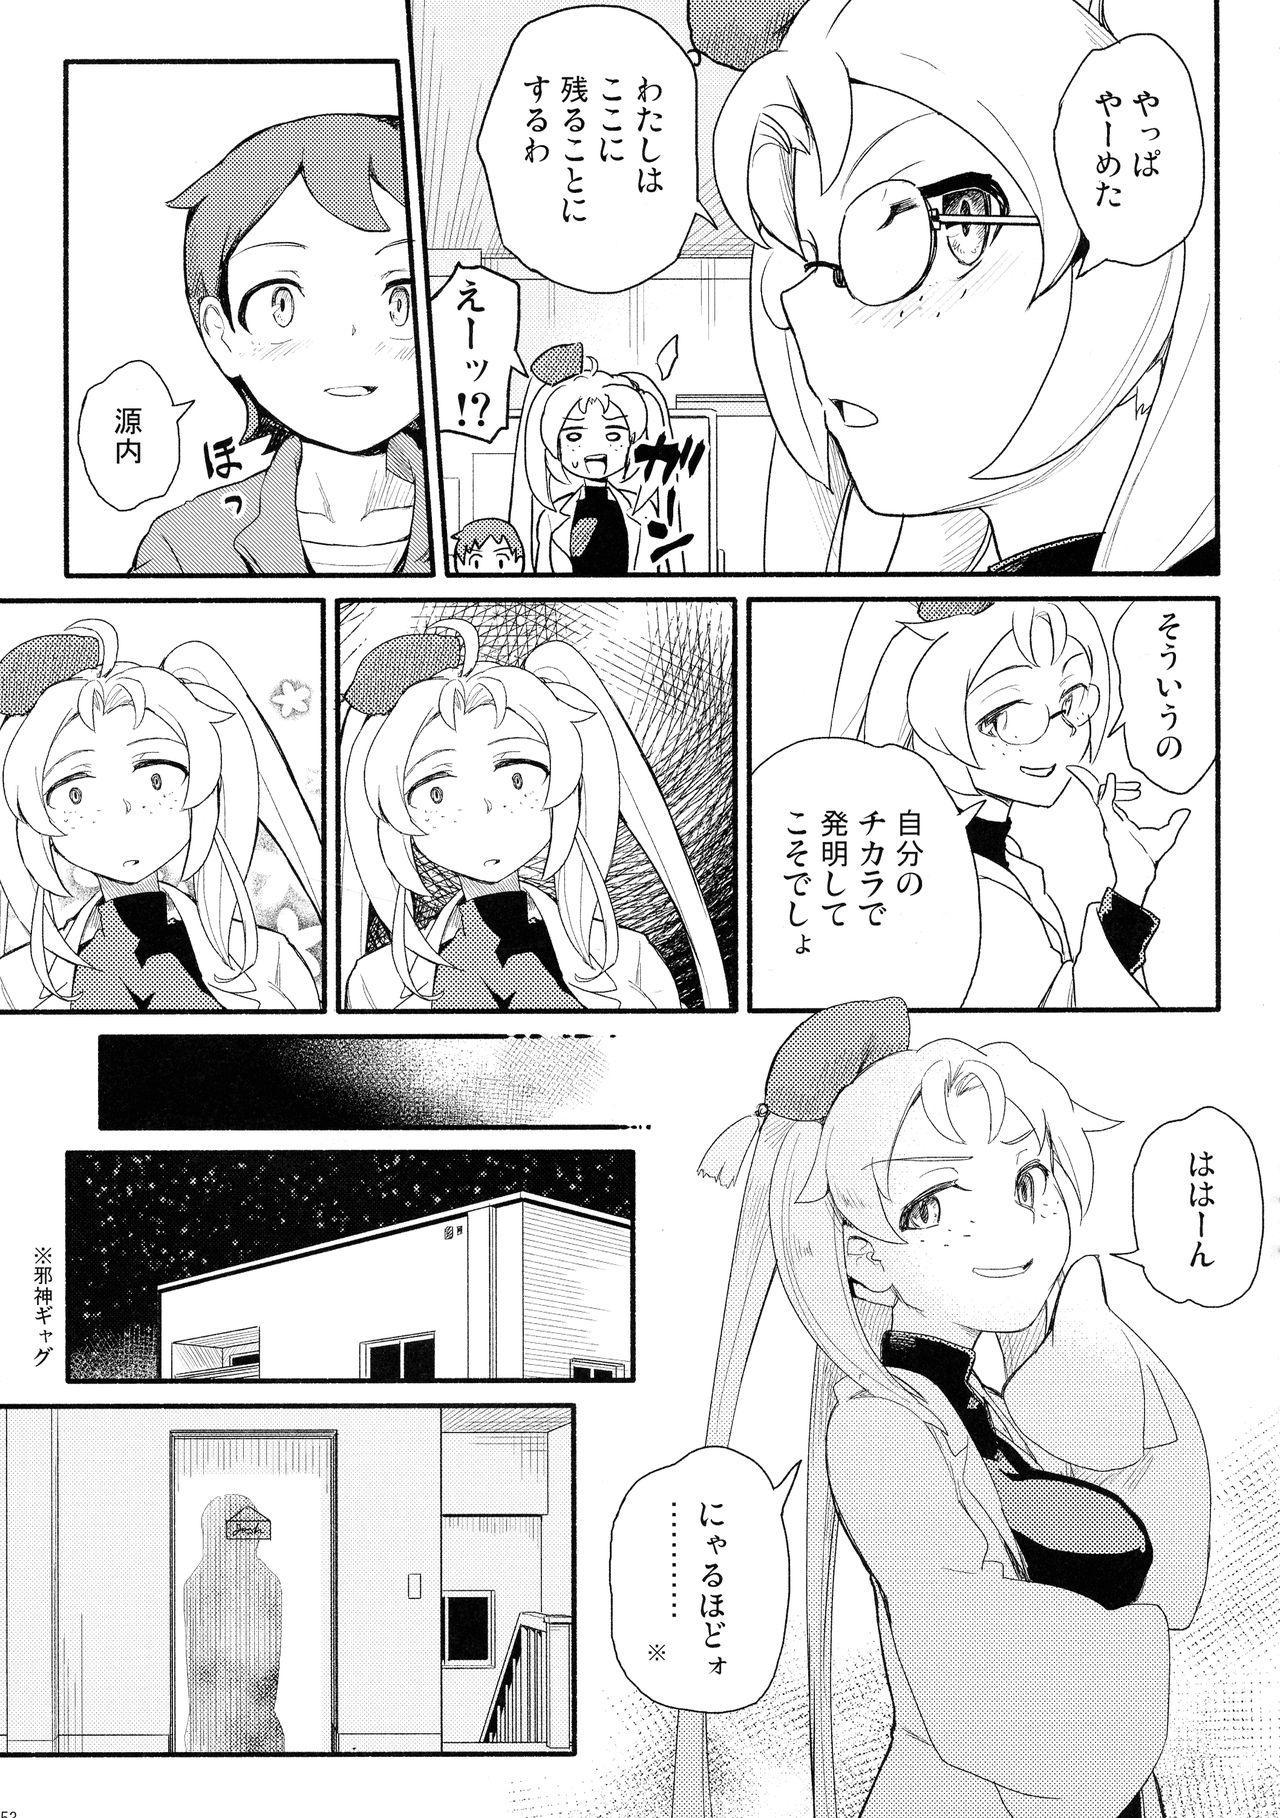 Muhou!! Hiraga Gennai-chan Ecchi Goudoushi 52